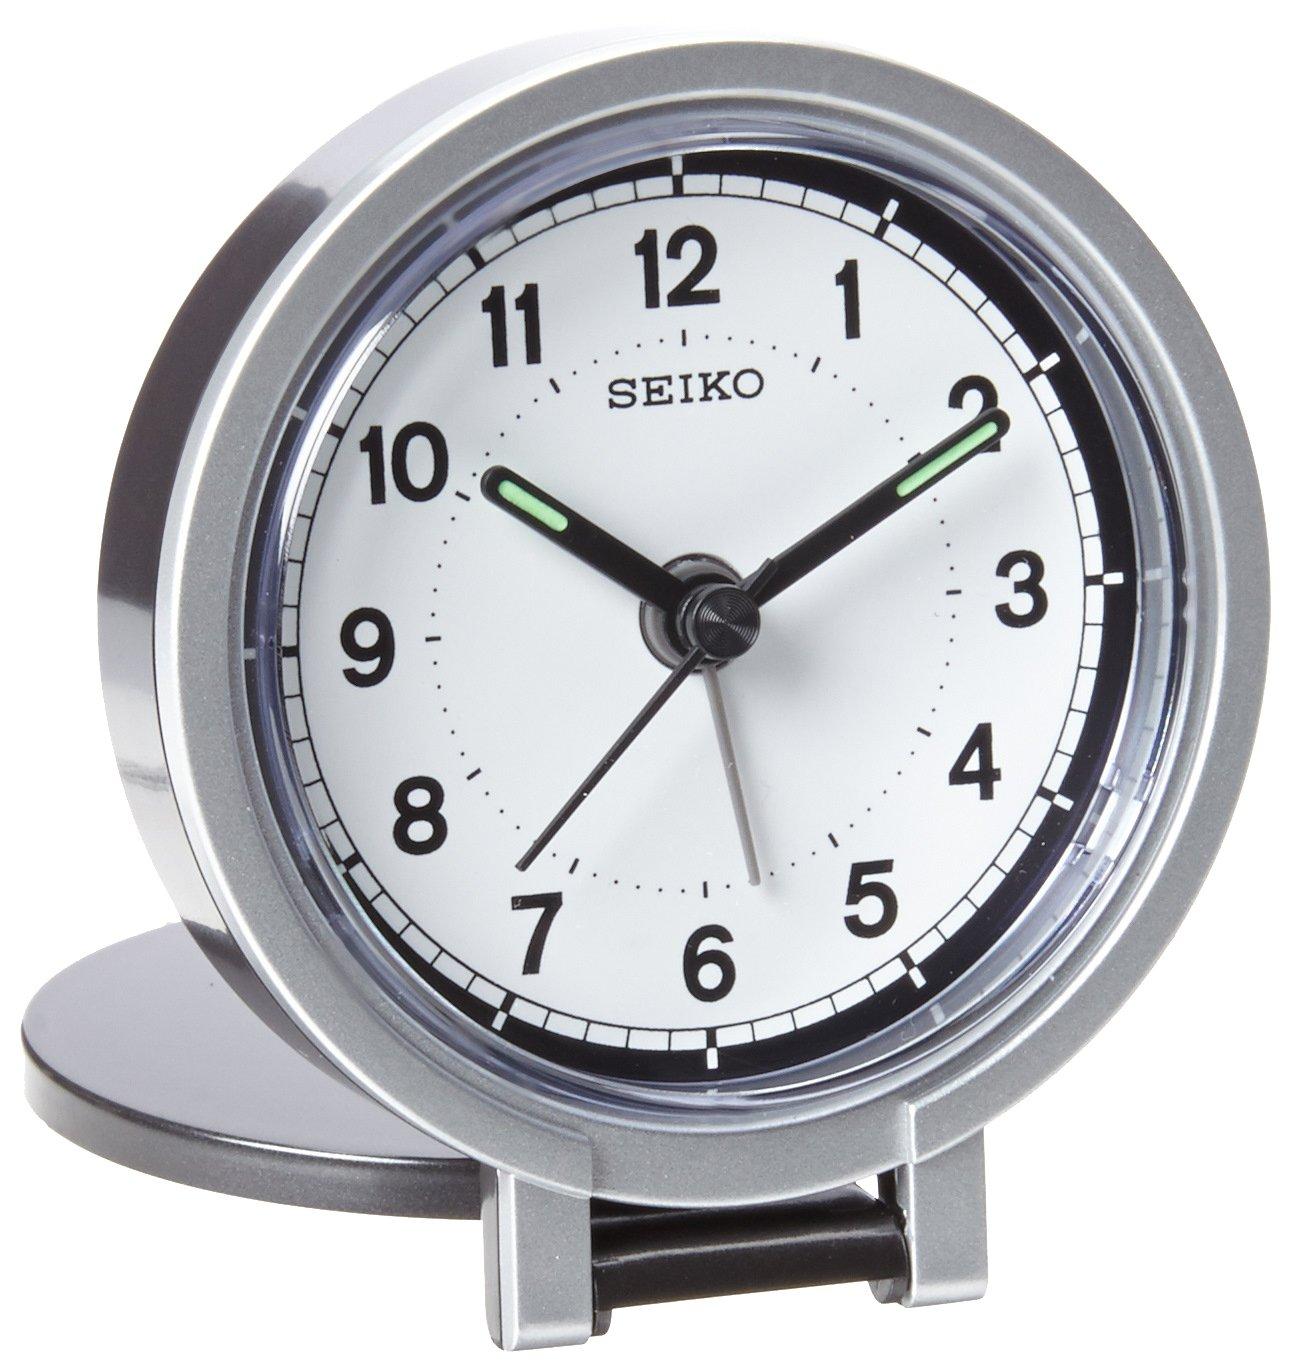 Seiko QHT011KLH Travel Analog Clock Seiko International